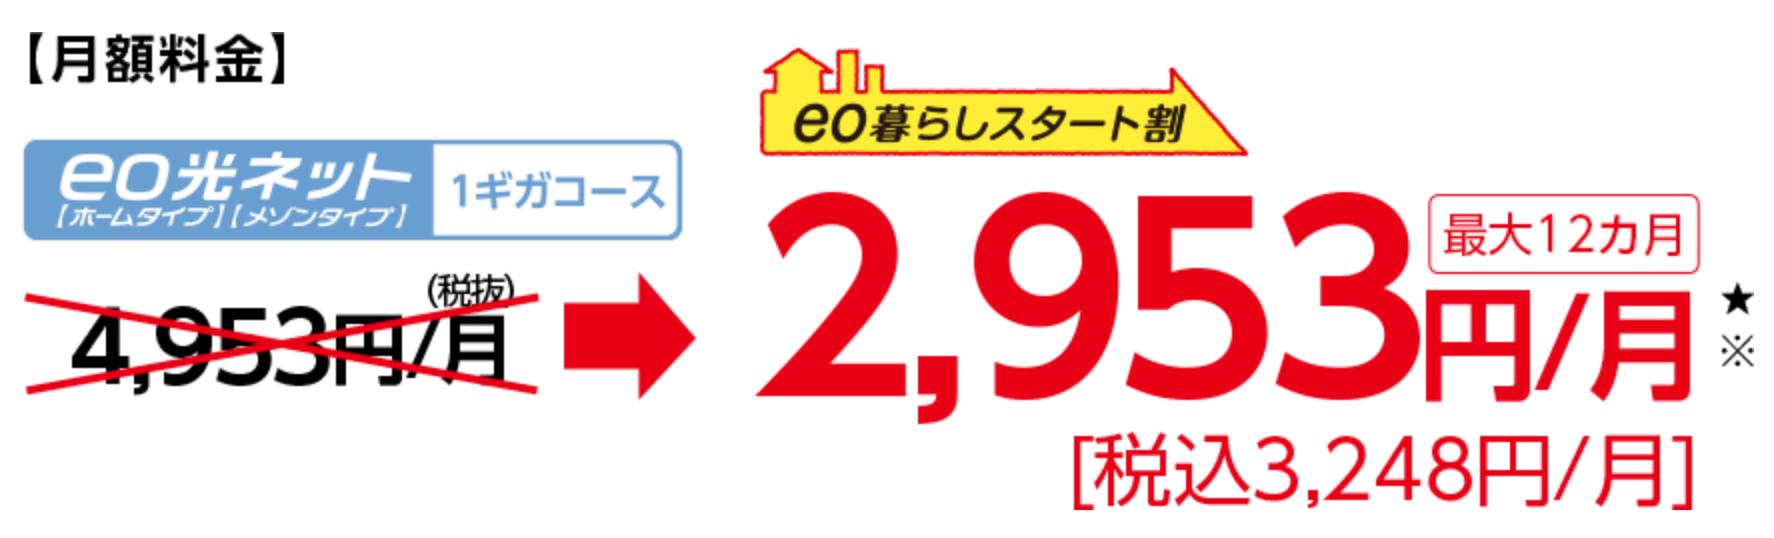 eo光スタートキャンペーン